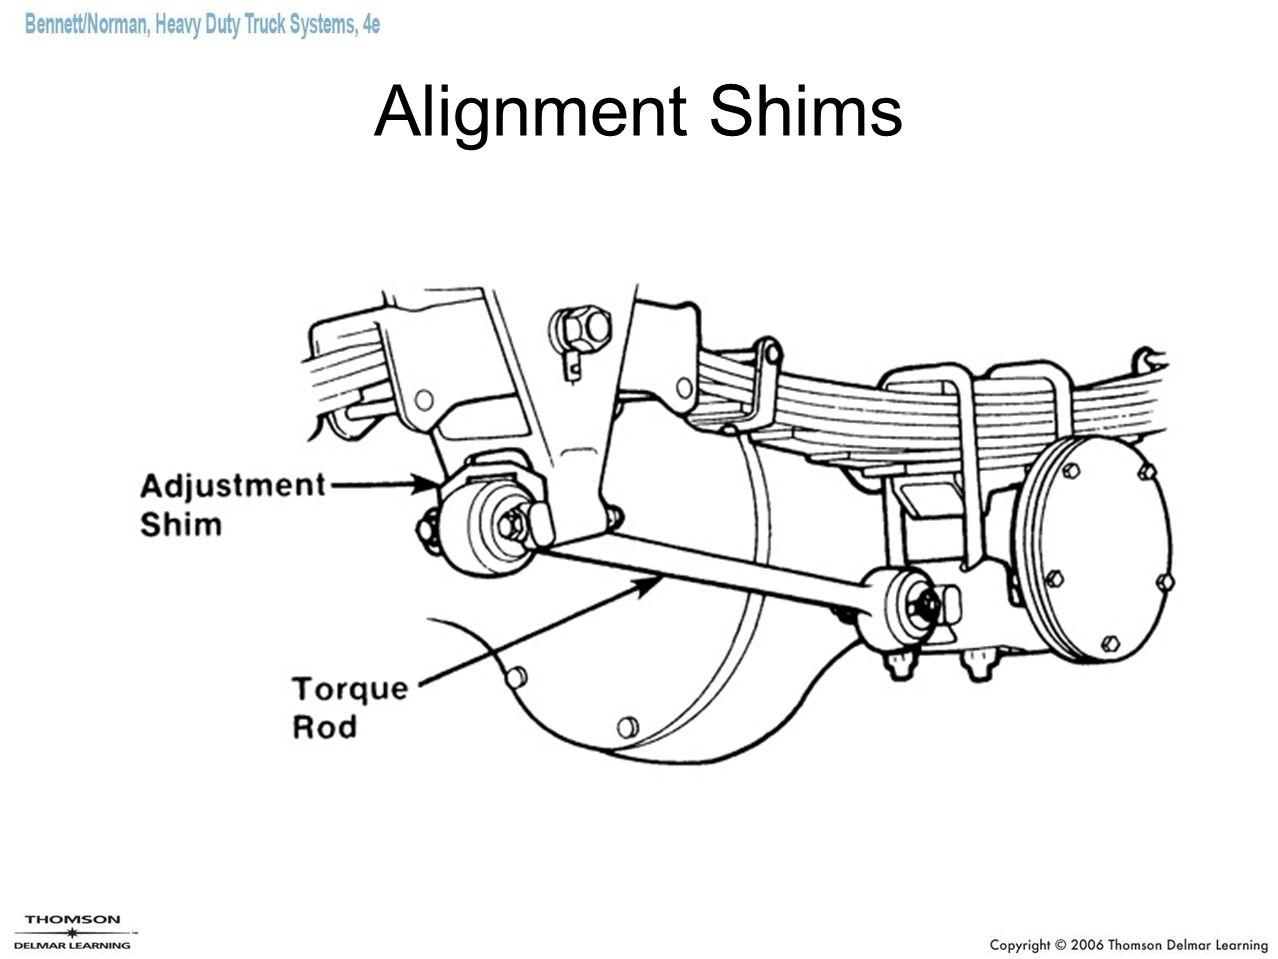 Alignment Shims